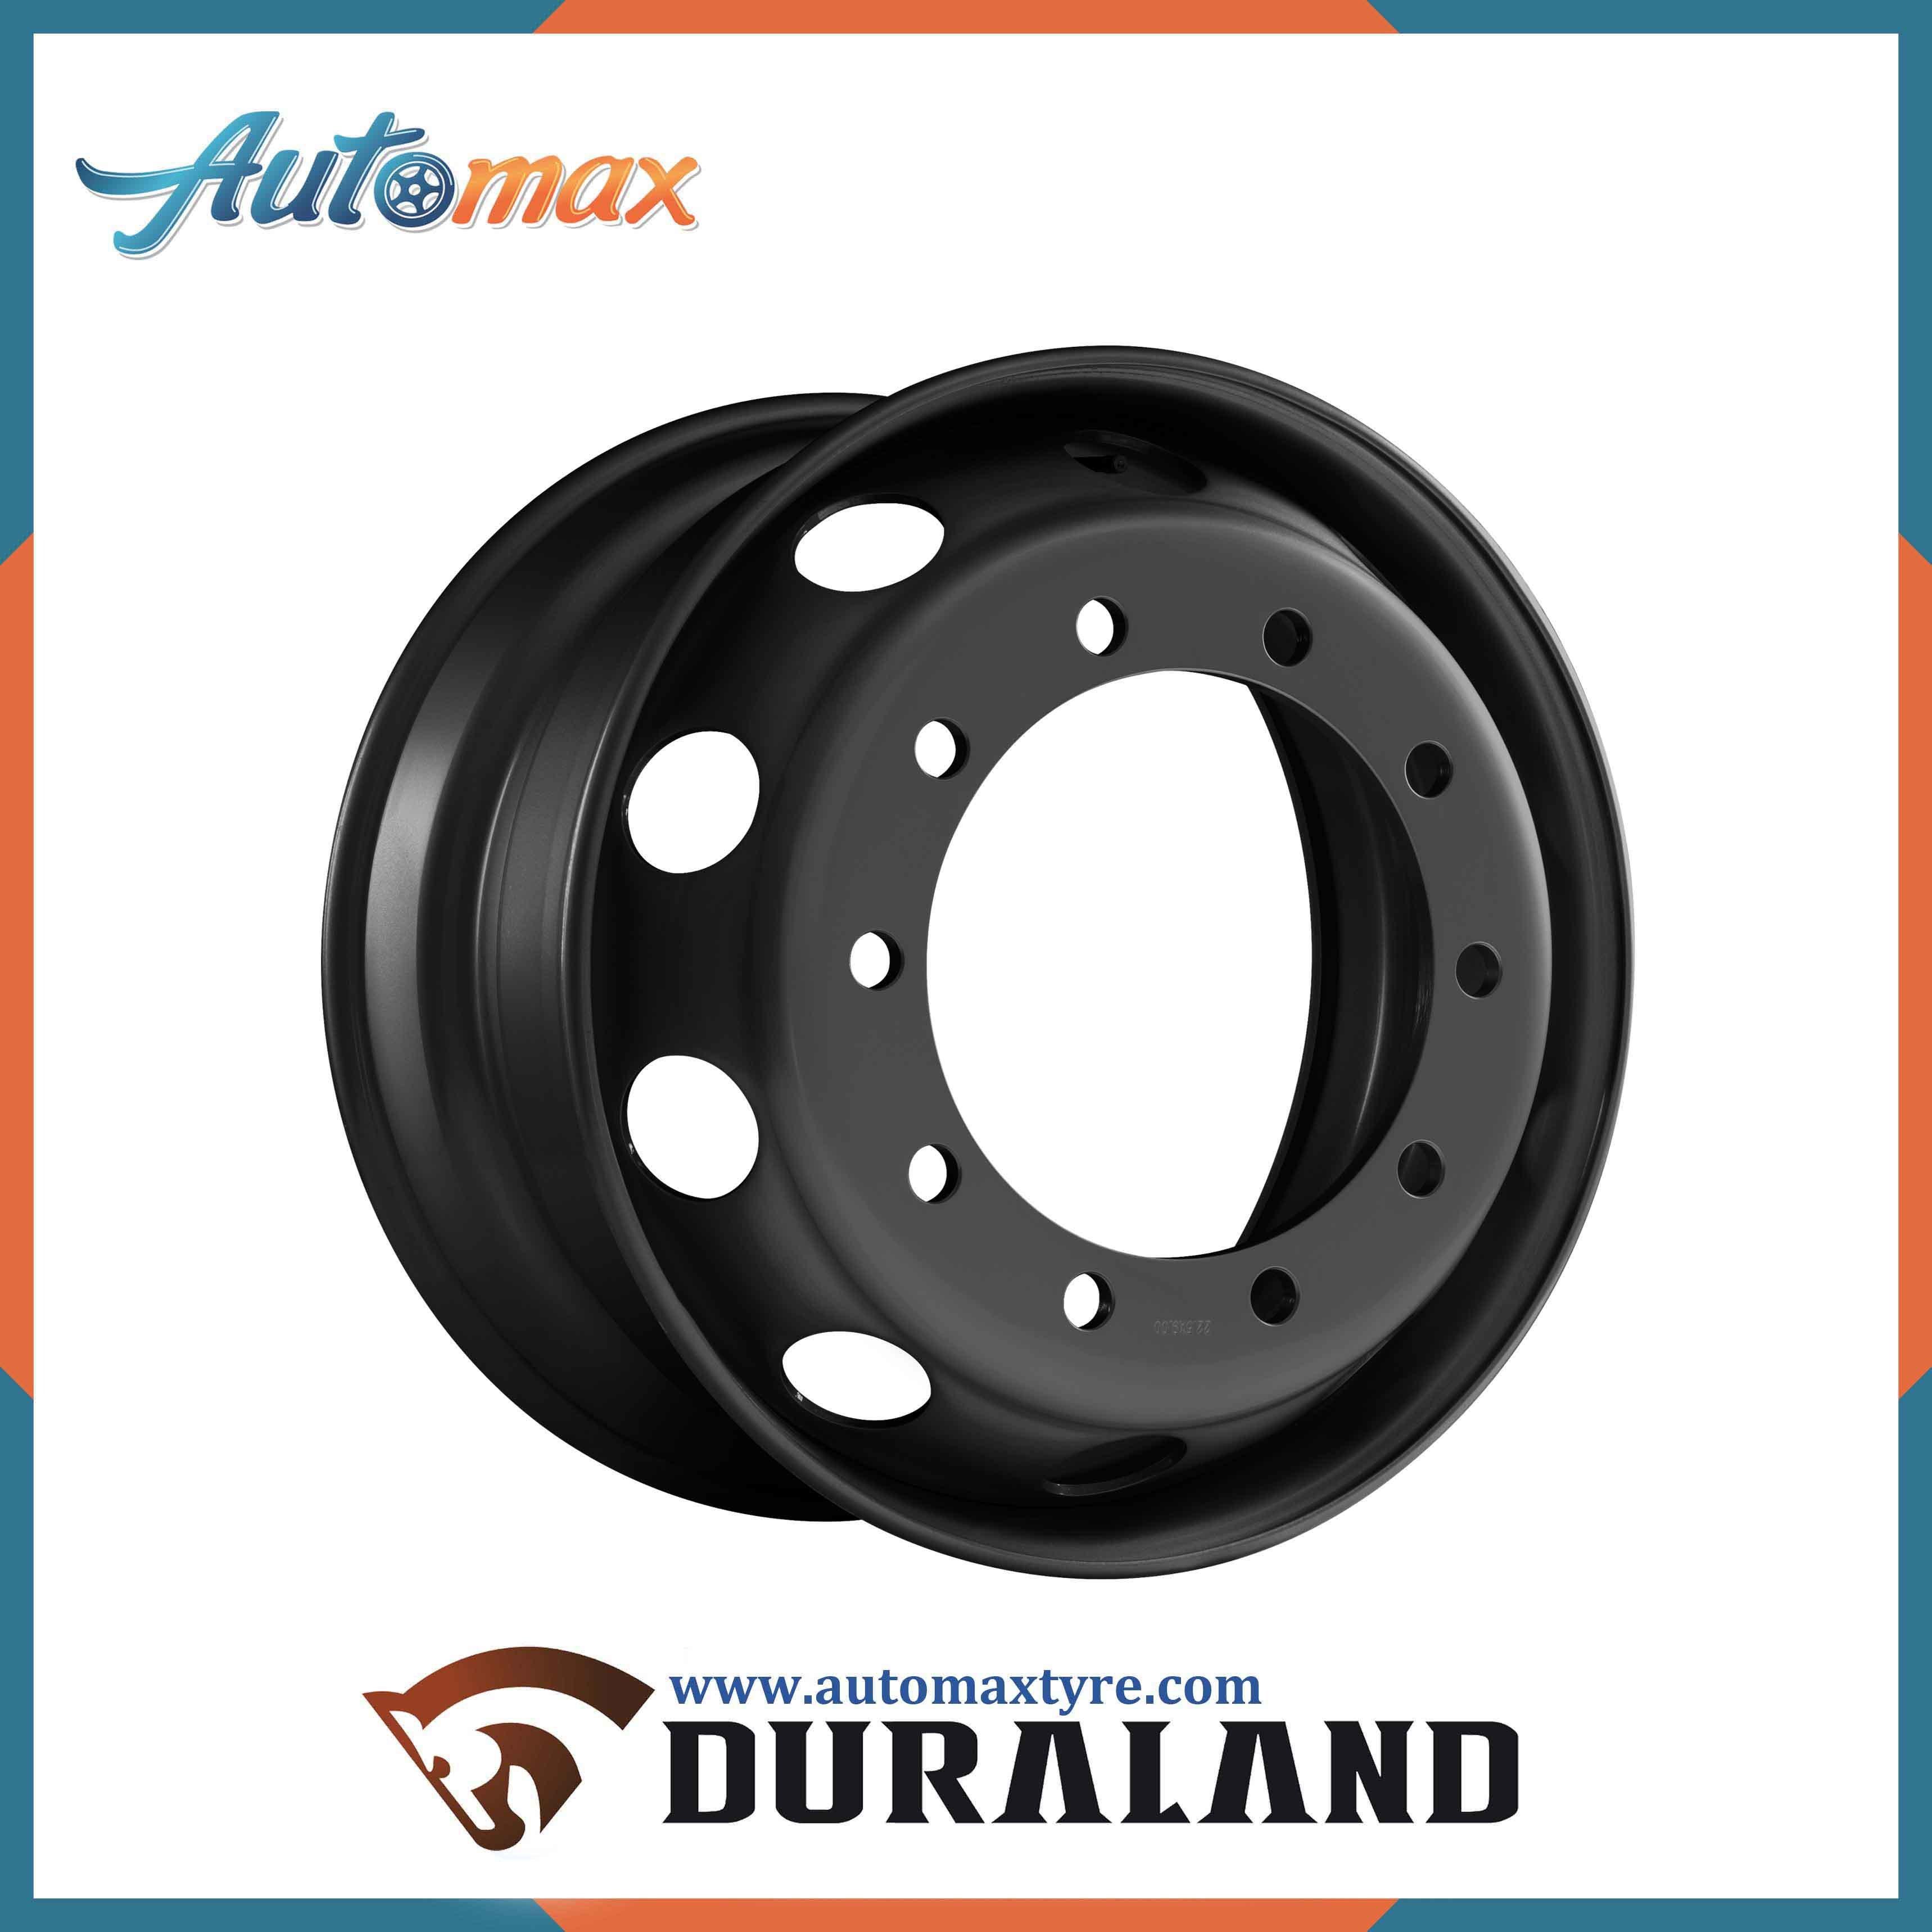 22.5X14.00, 22.5X16.00, 22.5X20.00 22.5X8.25 Steel Wheel Rim